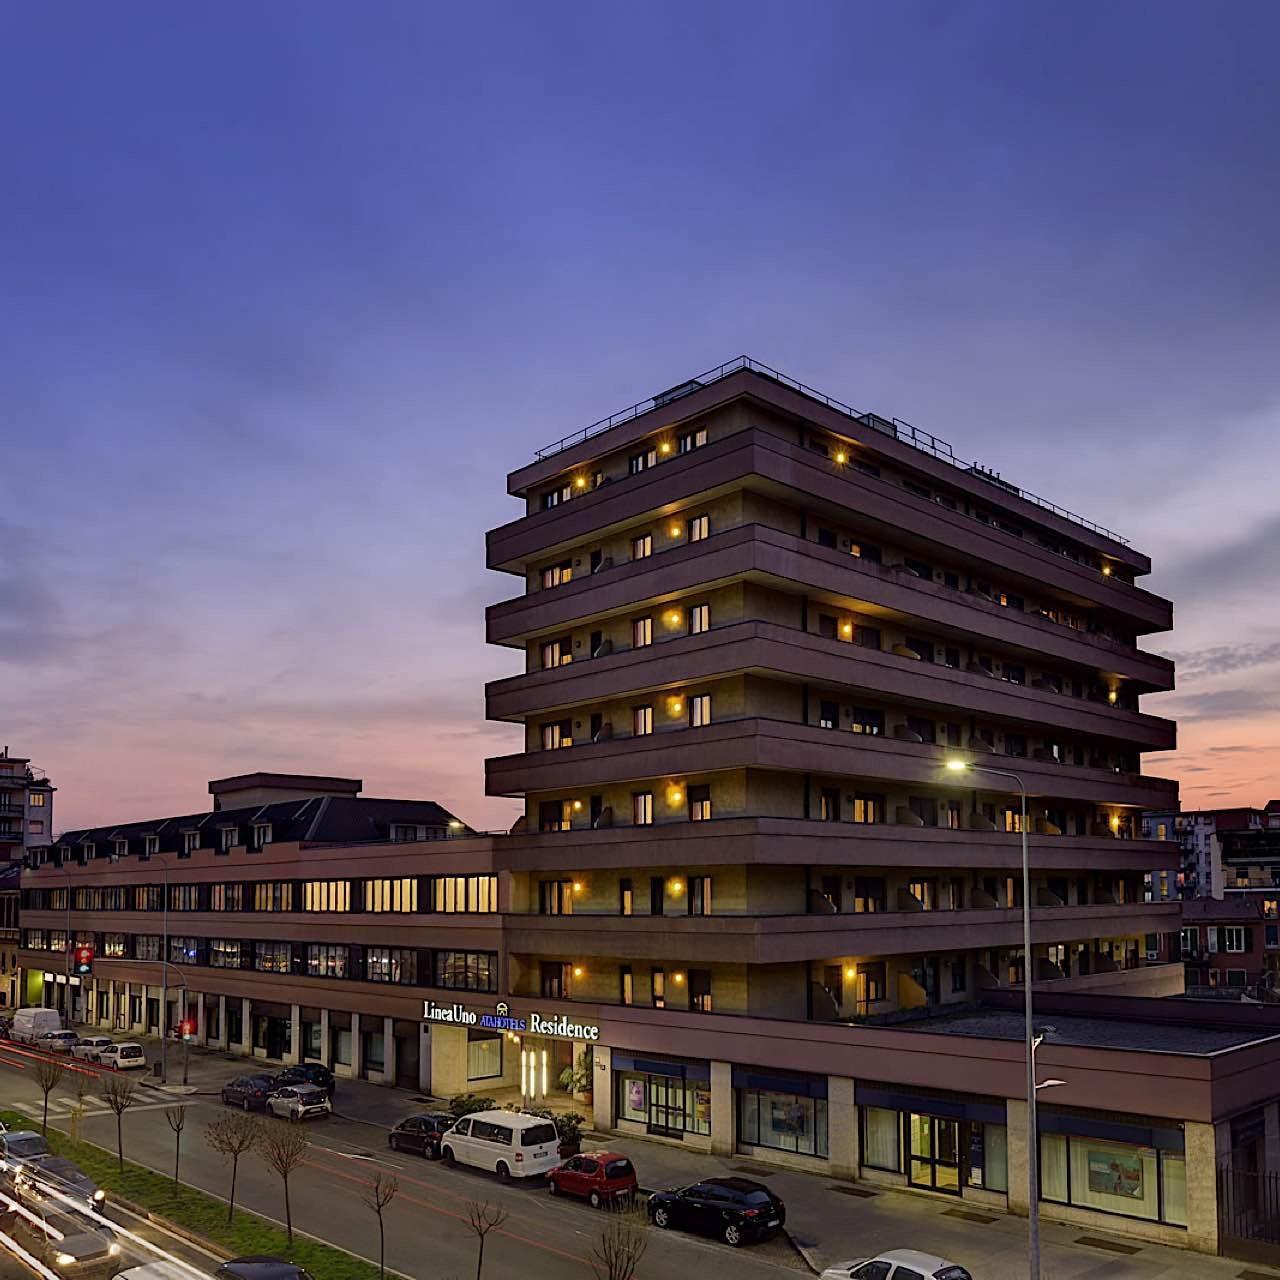 Exterior | Linea Uno Hotel & Residence Milano